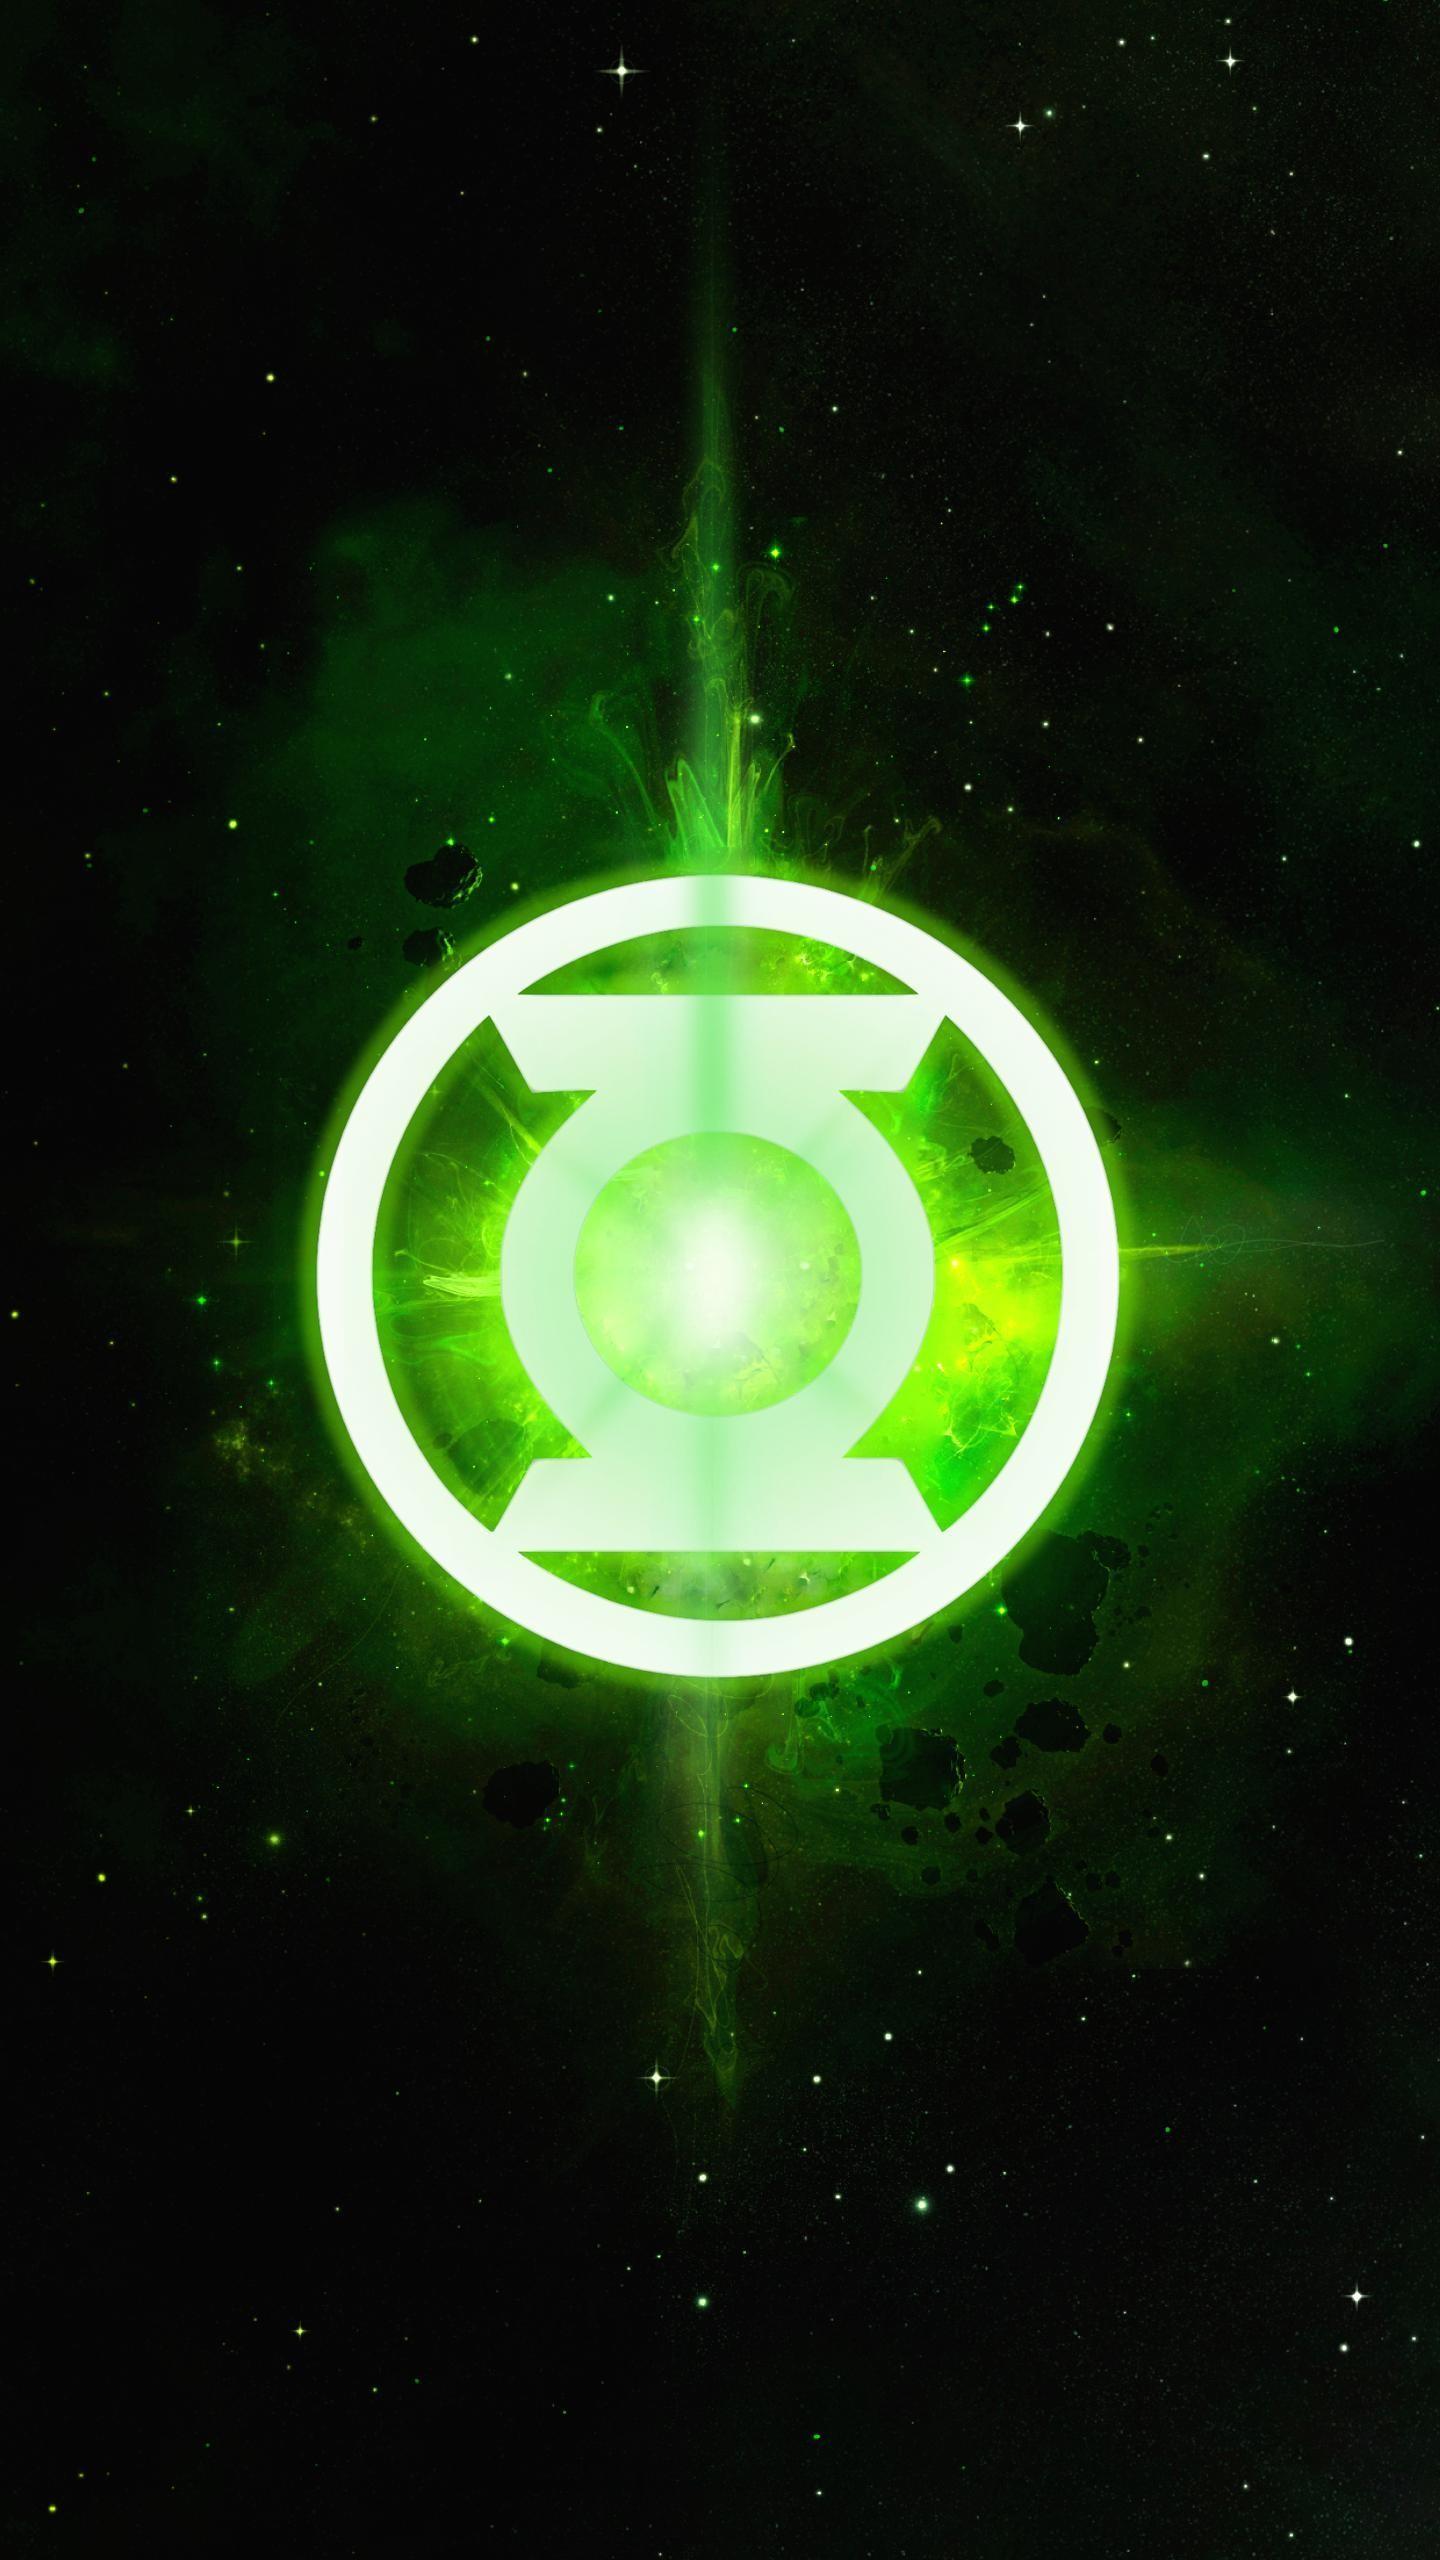 Green Lantern Corps Data Src Hd Wallpaper Green Lantern Logo 1440x2560 Download Hd Wallpaper Wallpapertip